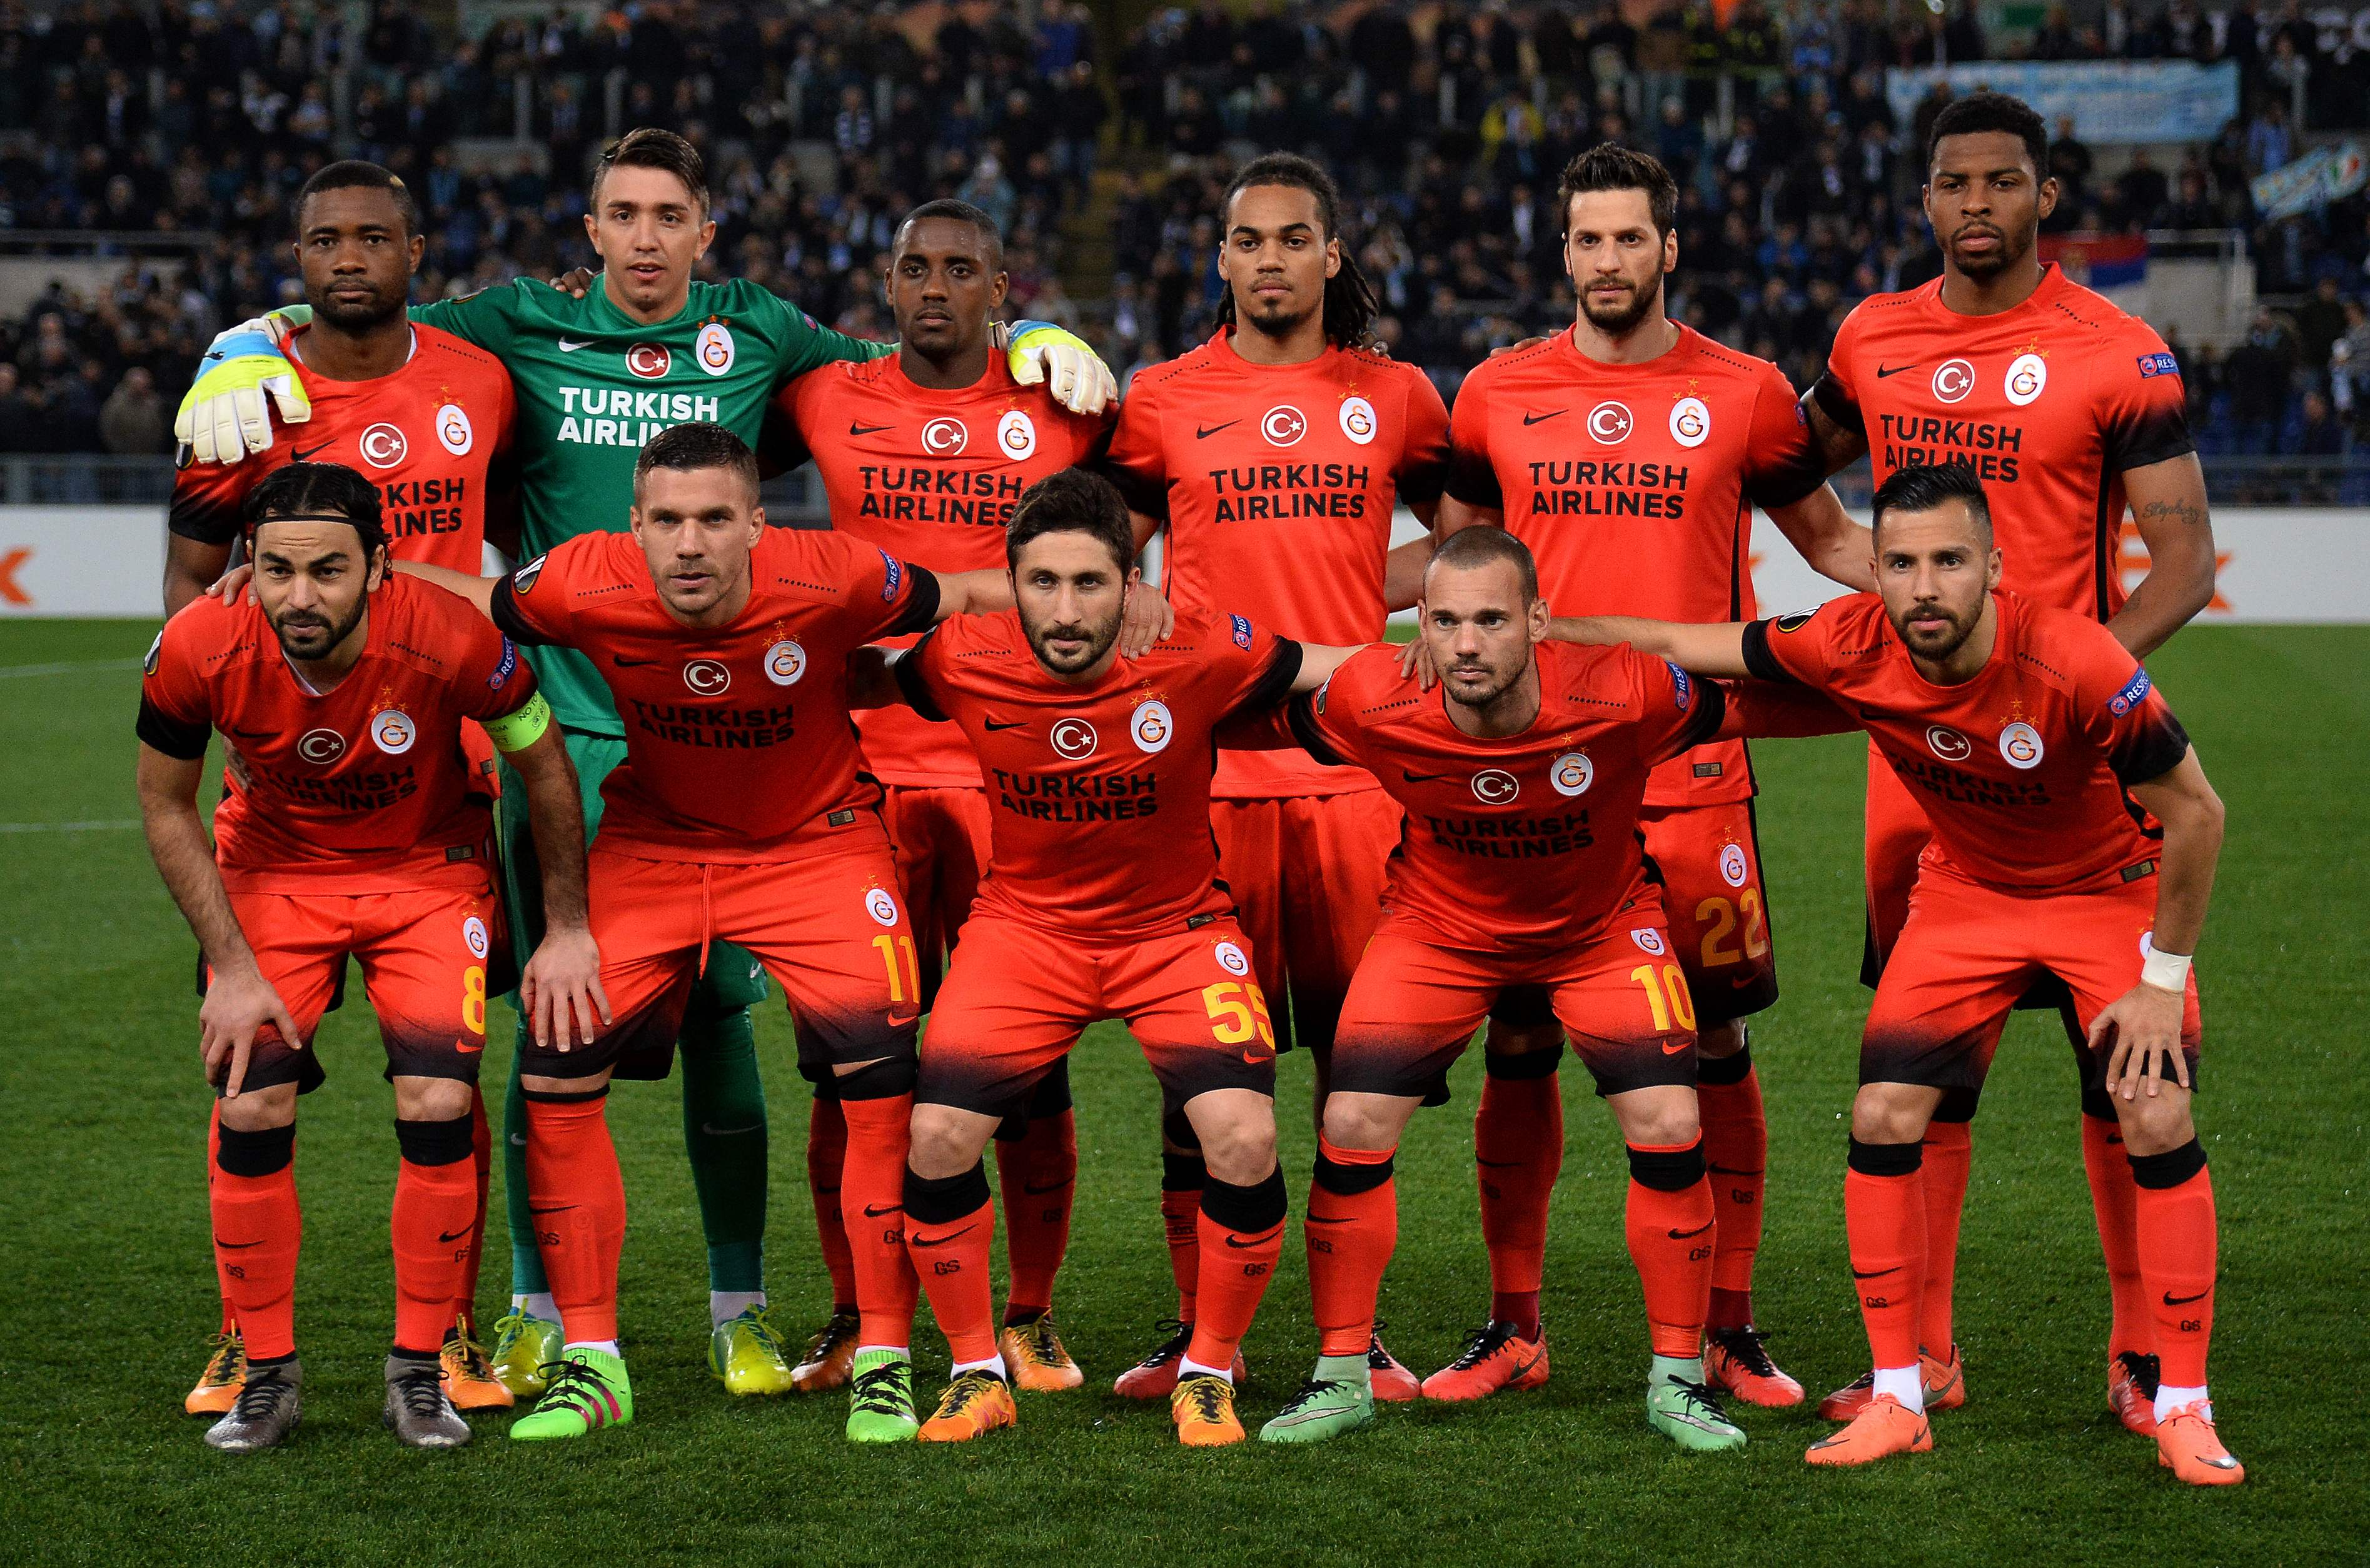 Turkey's Galatasaray get one-year European ban - UEFA